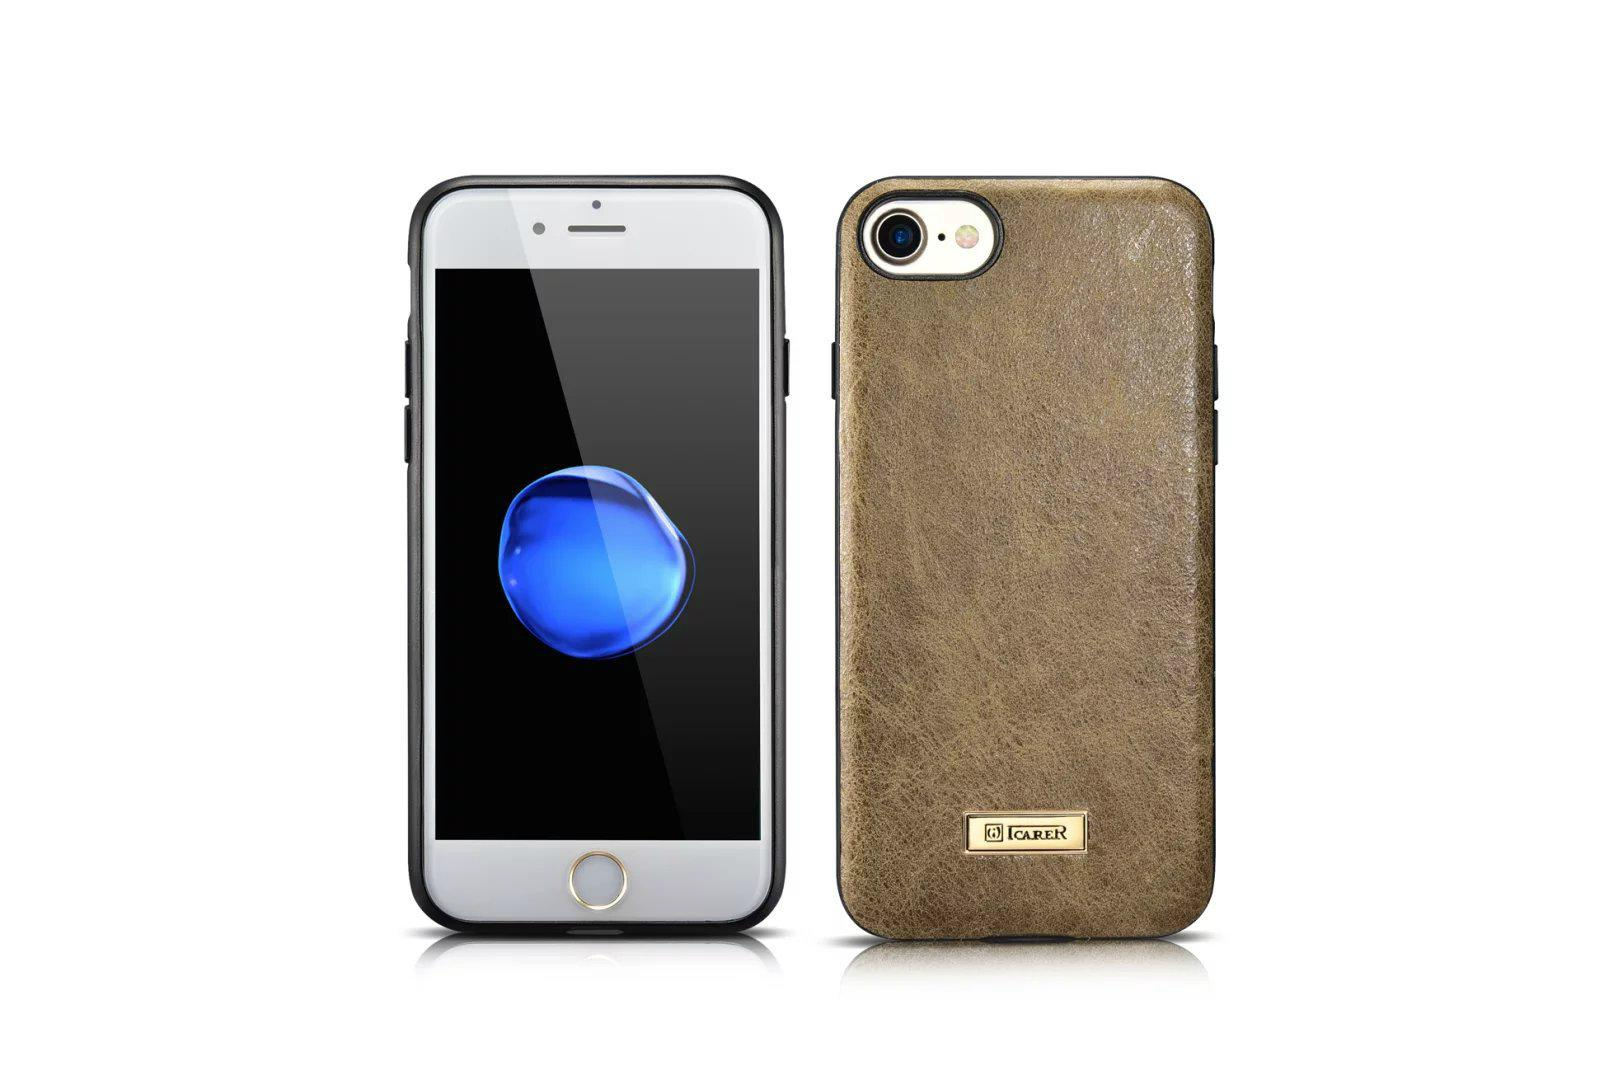 iCarer iPhone 7 Shenzhou Genuine Leather Fashional Back Cover Case 2